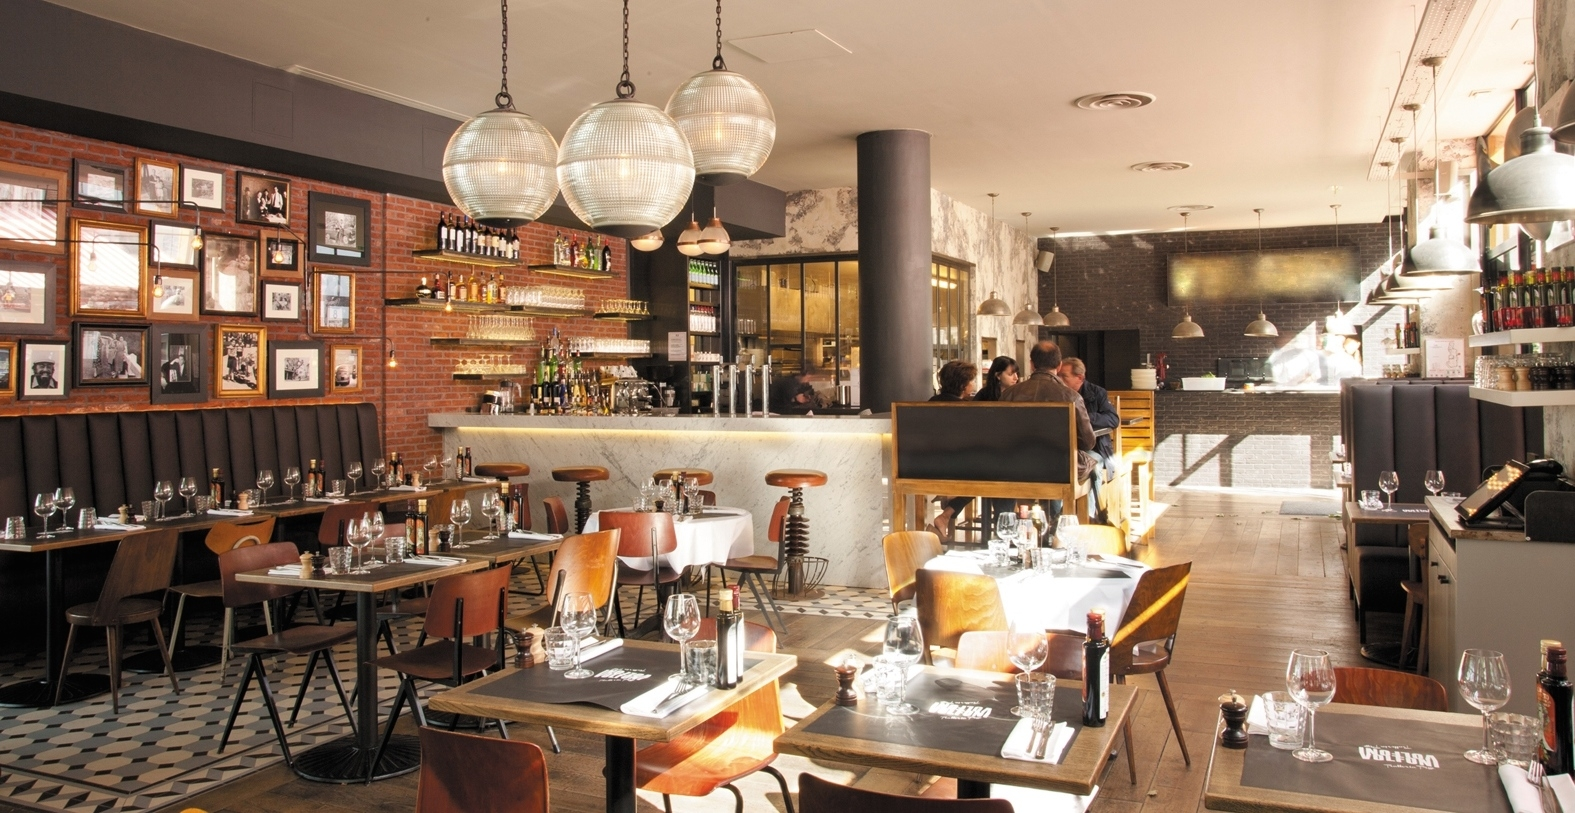 location restaurant hauts de seine boulogne billancourt 92100 event collection. Black Bedroom Furniture Sets. Home Design Ideas